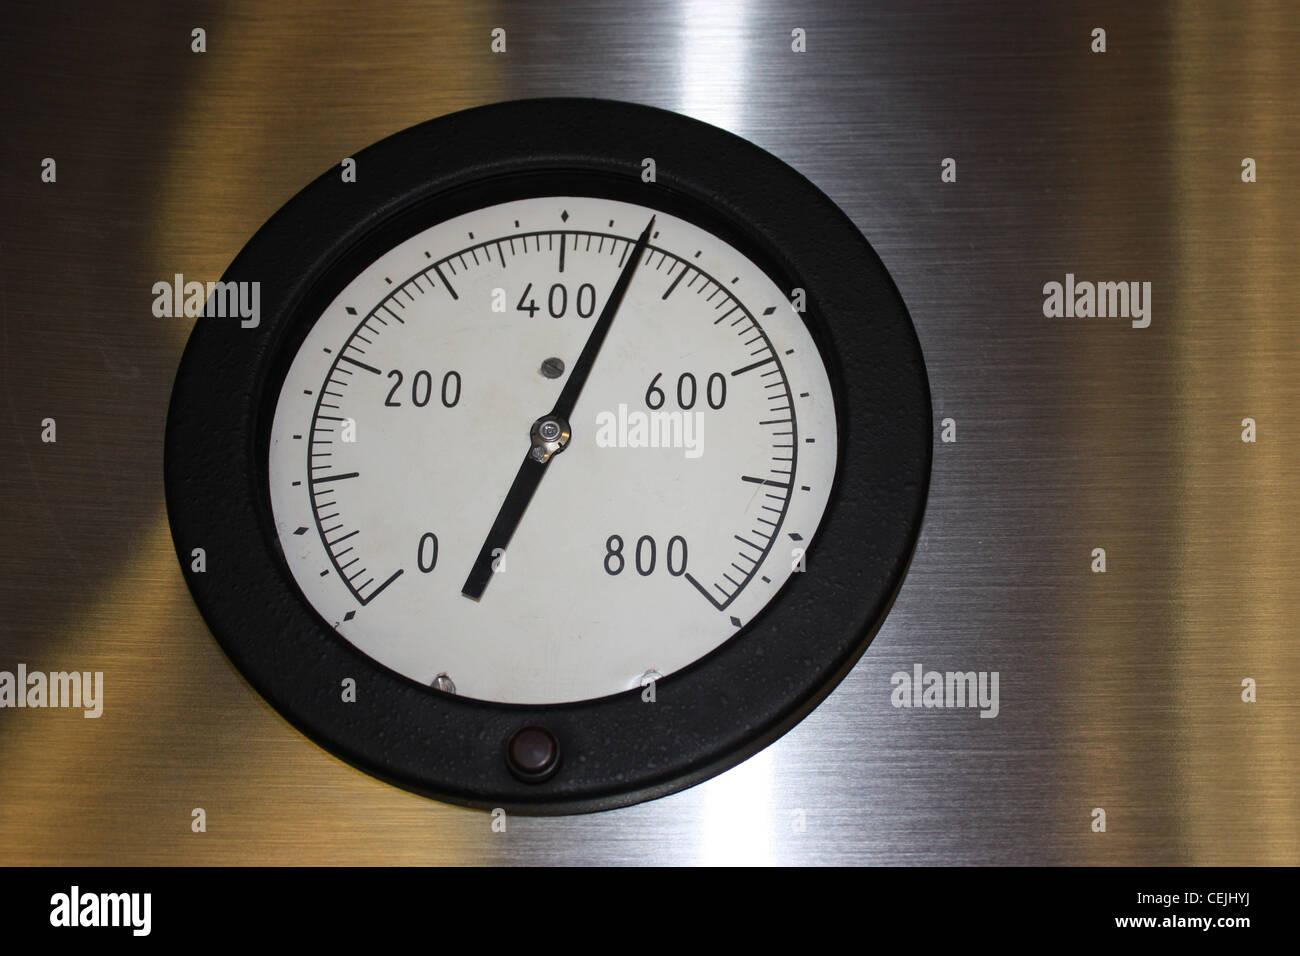 Pressure gauge instrument to monitor pressure. - Stock Image